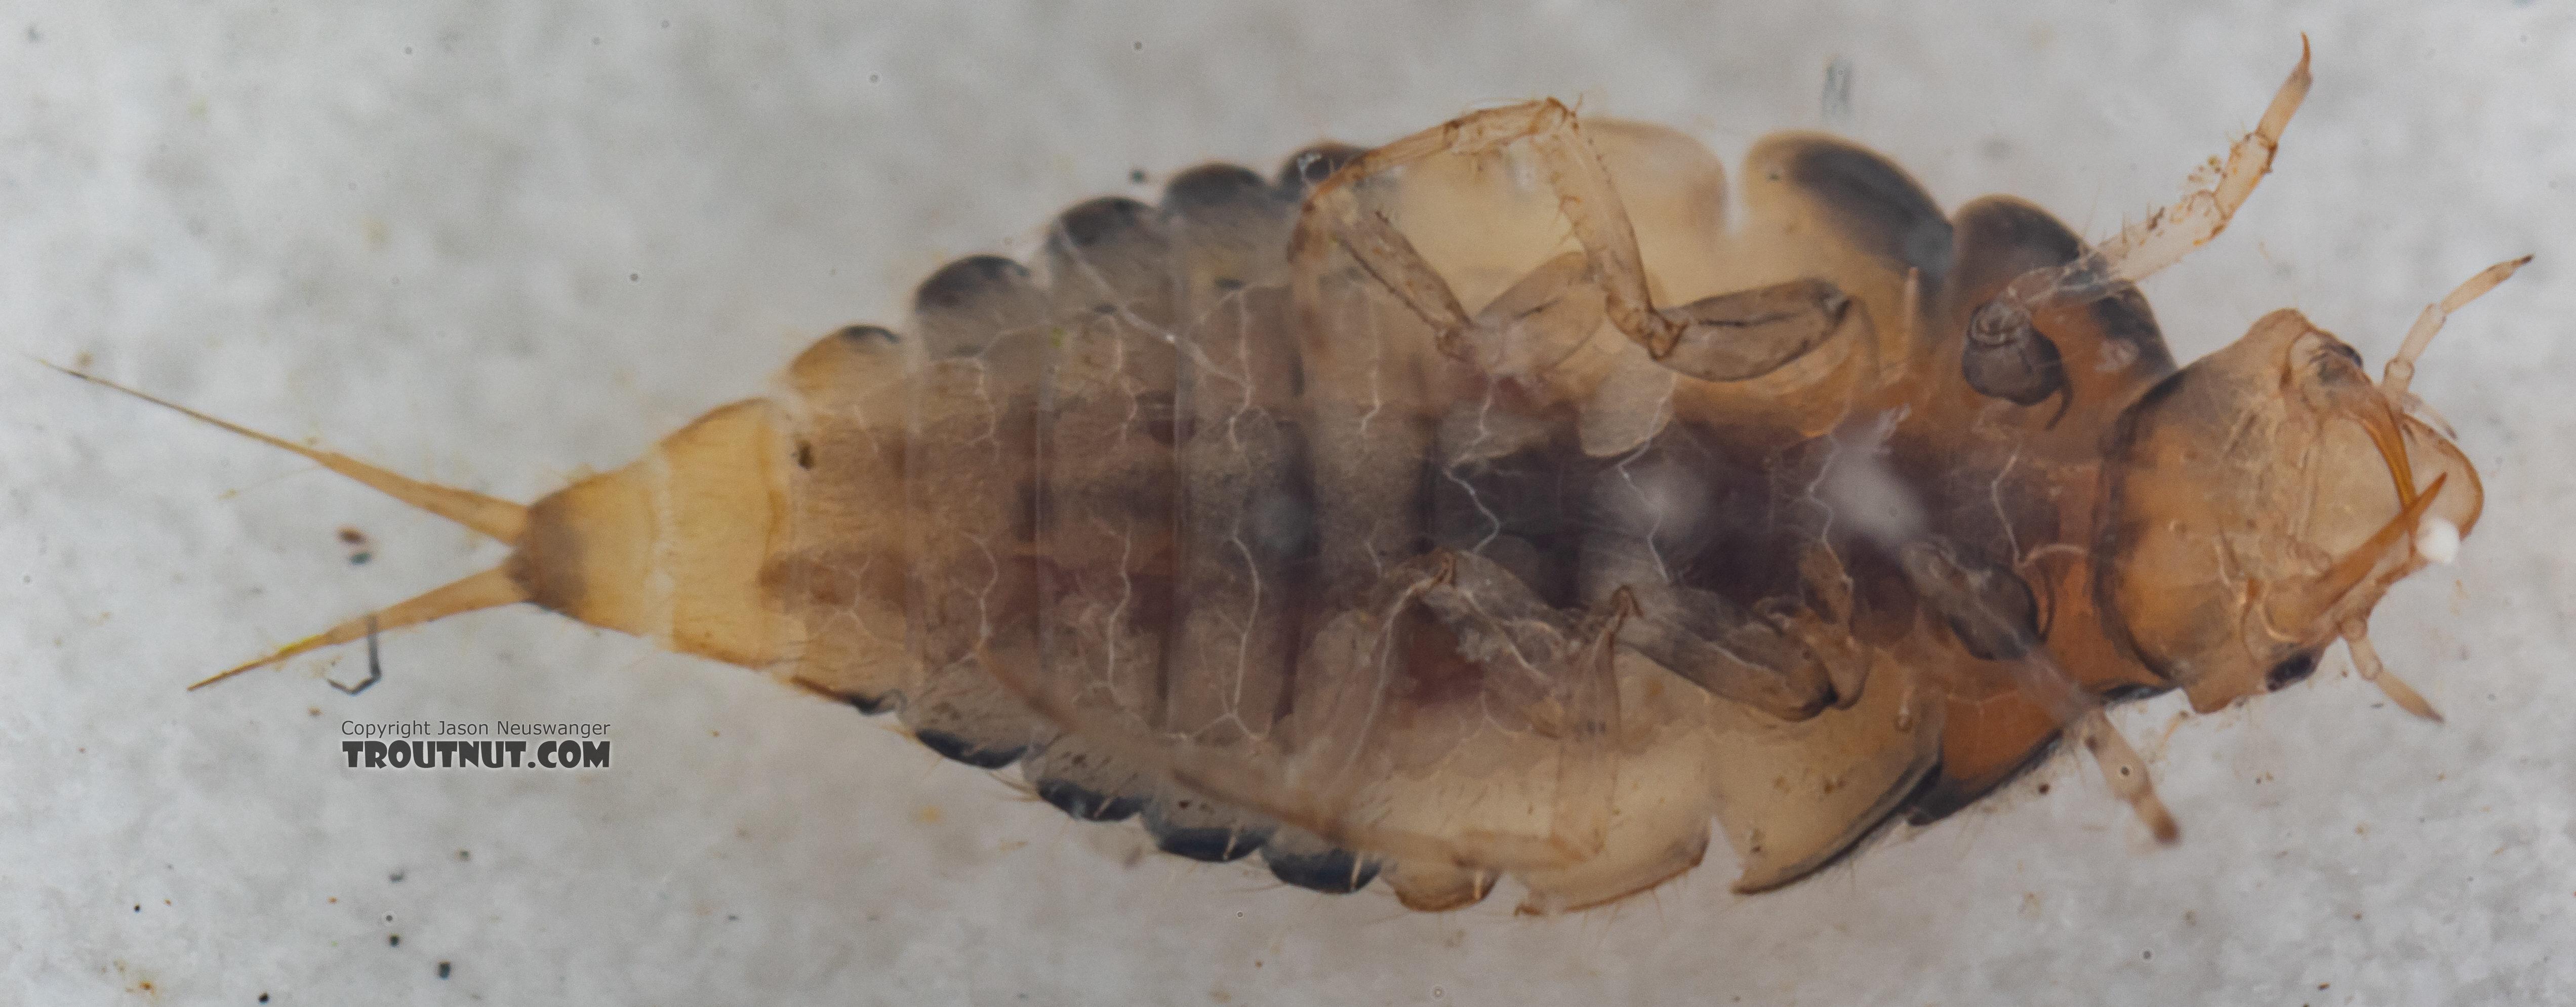 Coleoptera (Beetles) Beetle Larva from Mystery Creek #249 in Washington